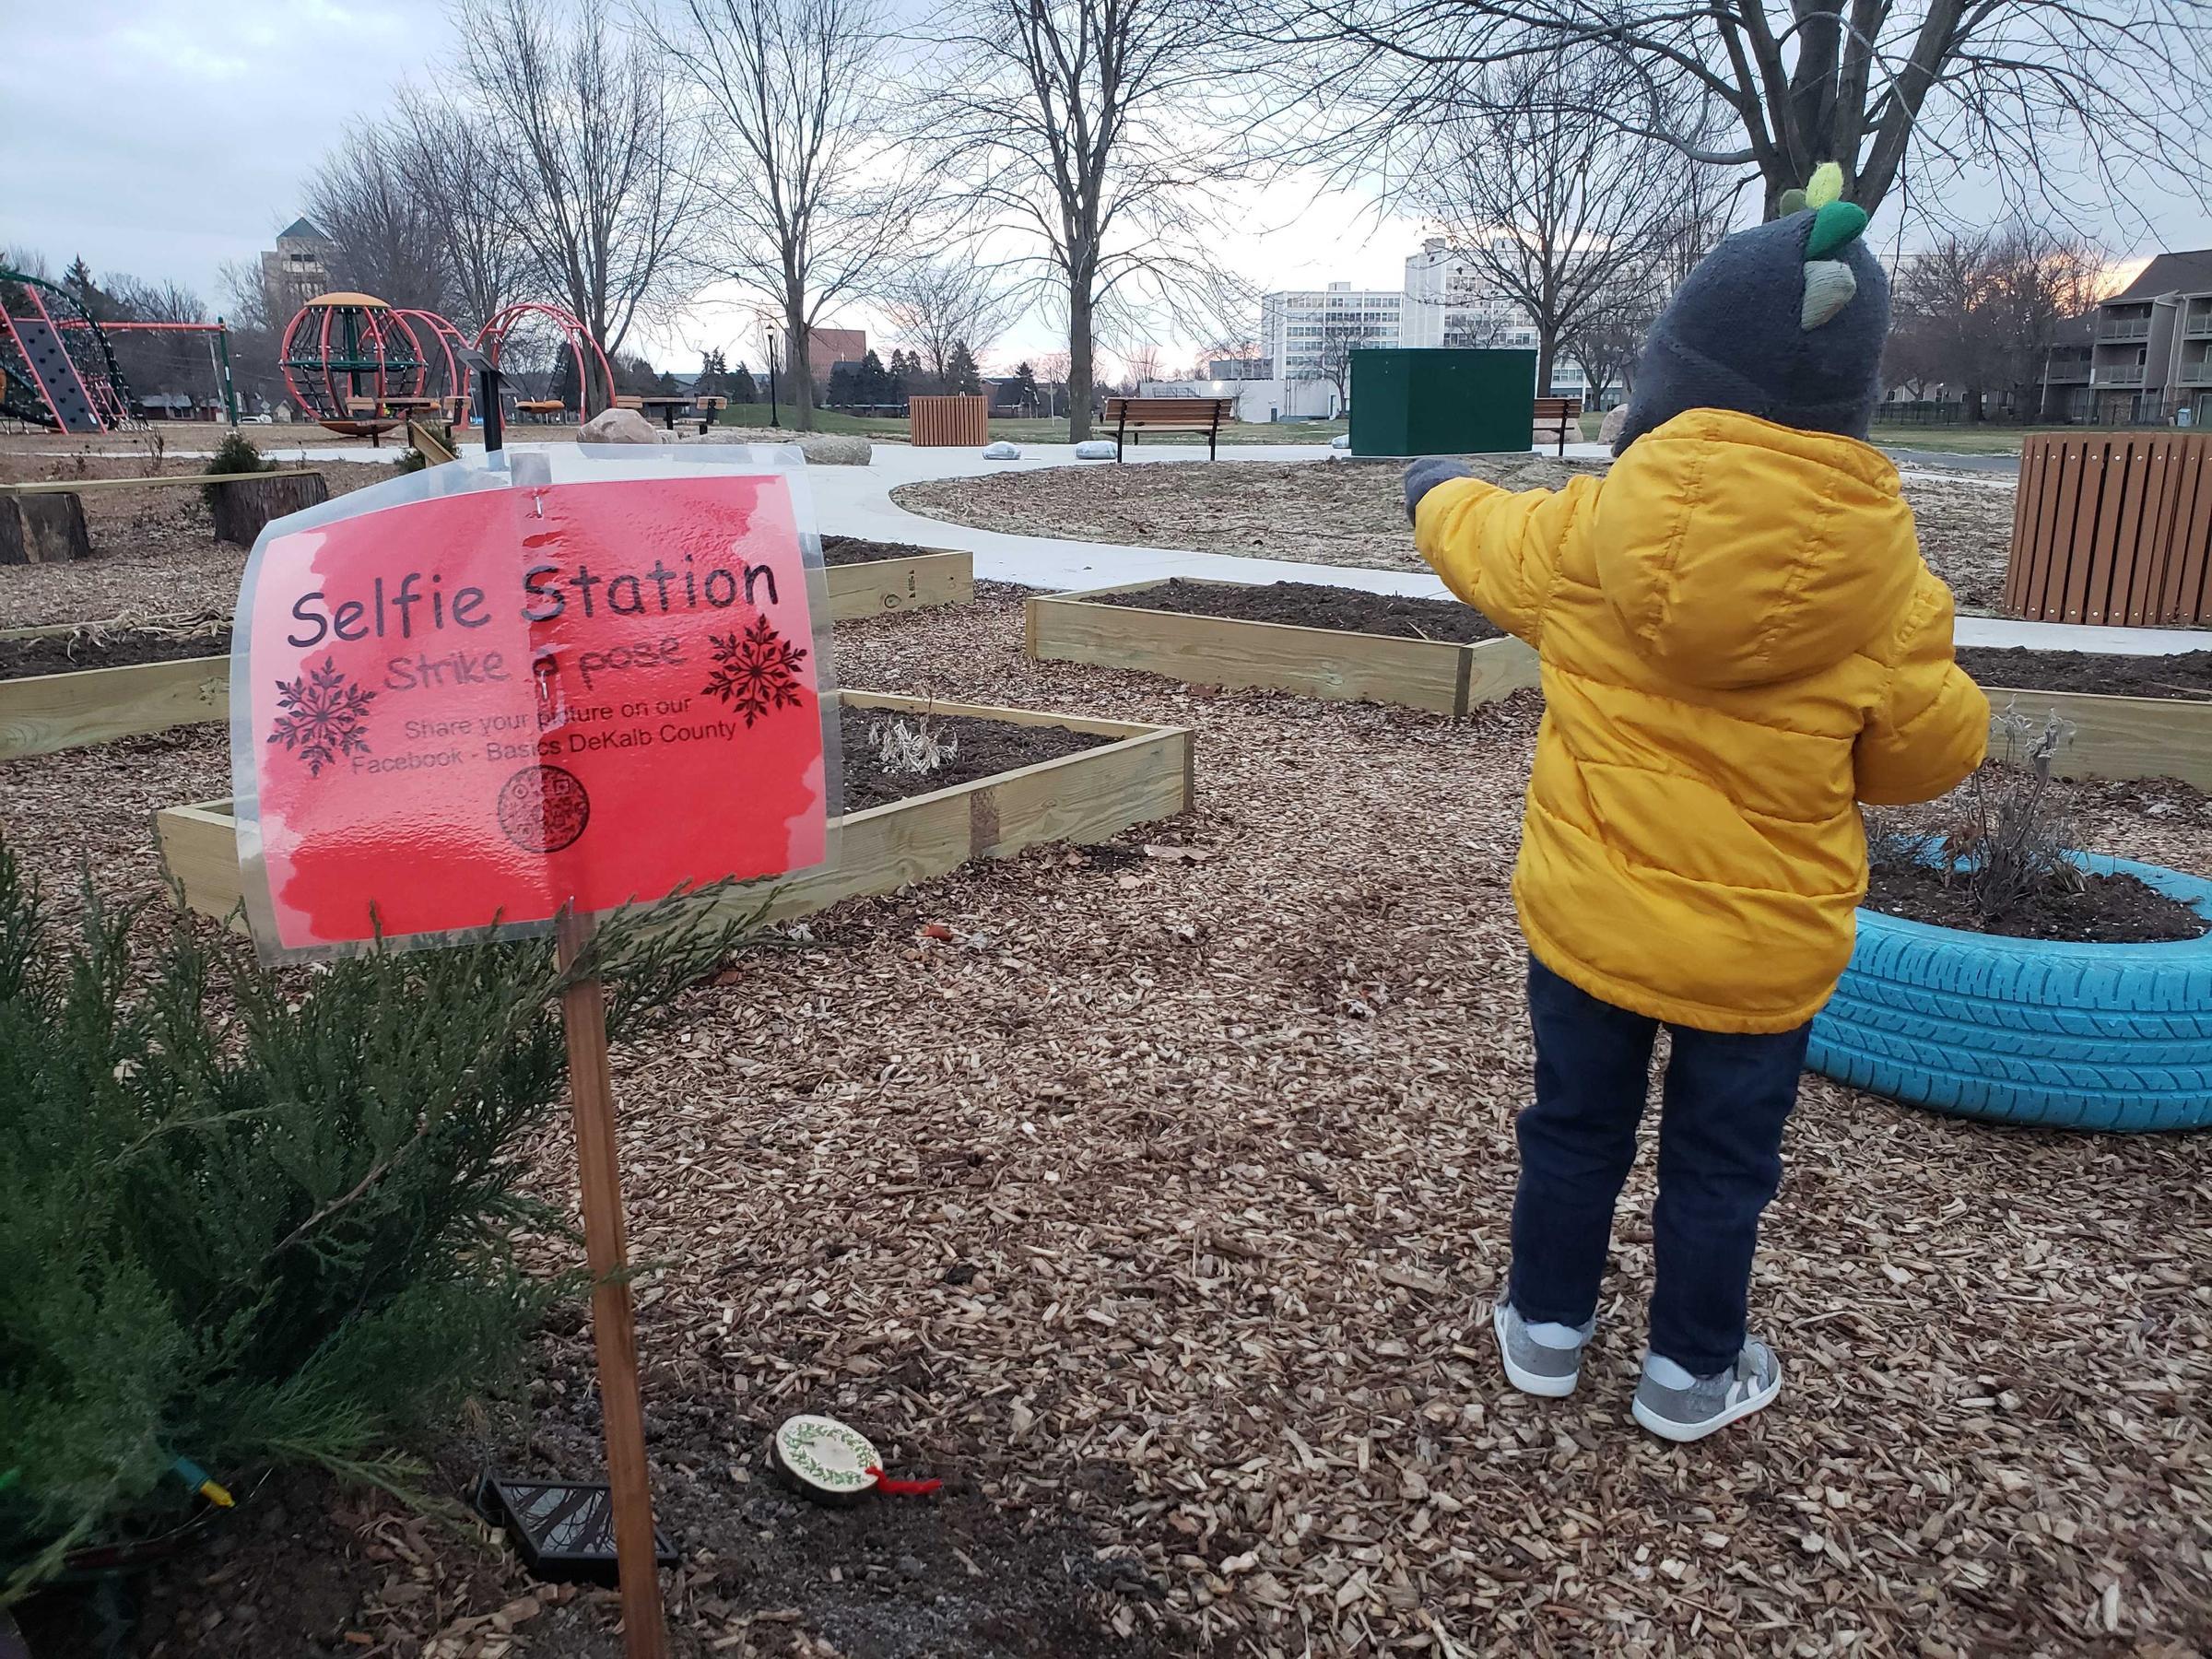 A 'Toddler Garden' Is Coming To DeKalb